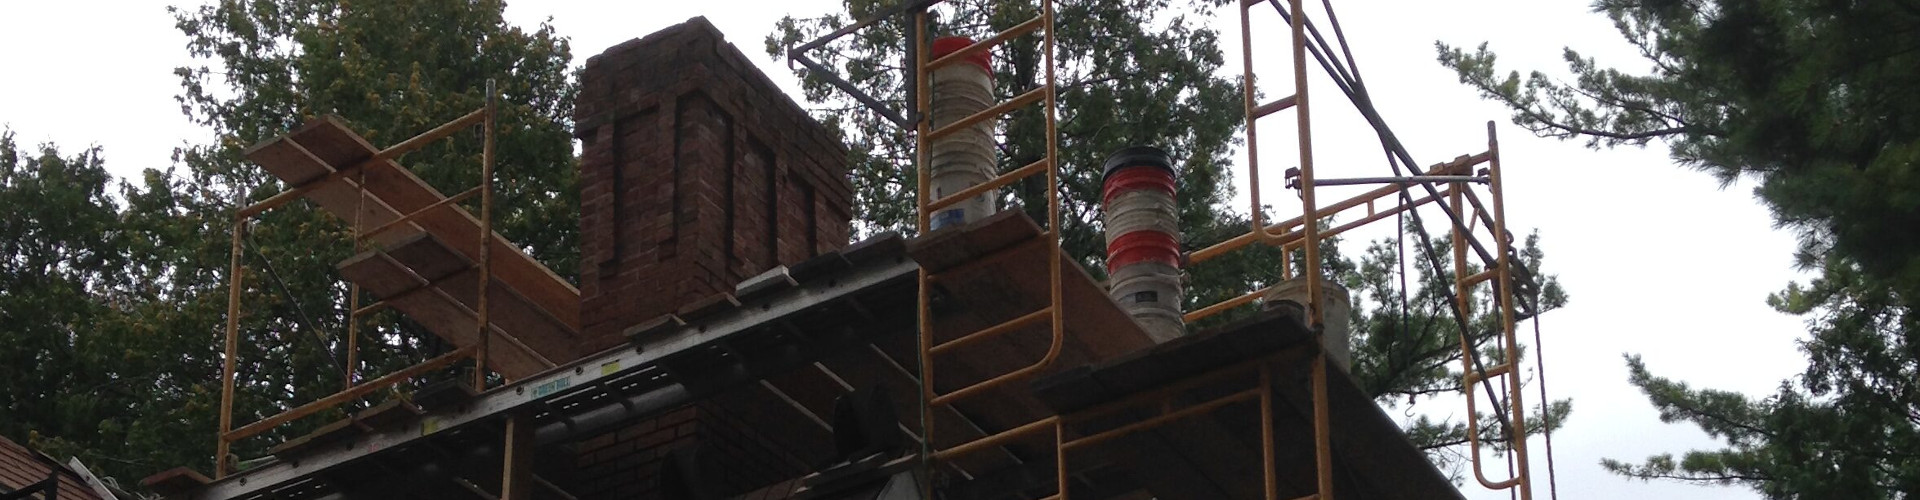 chimney, scaffolding